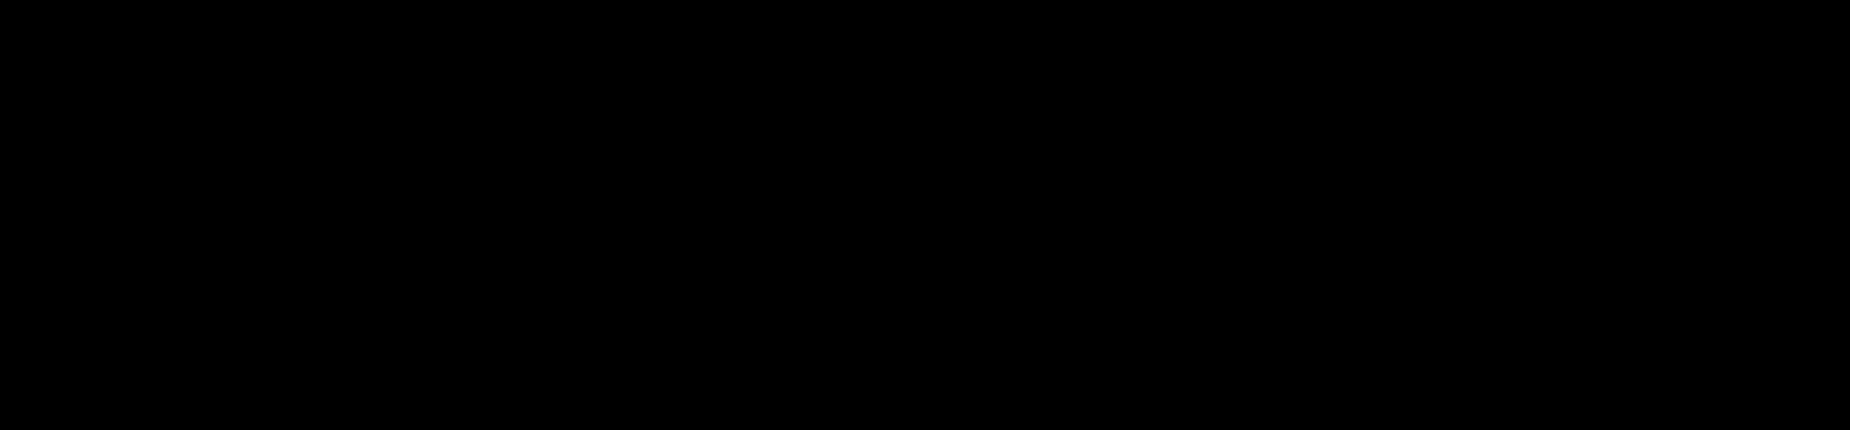 cm-logo-black_v2